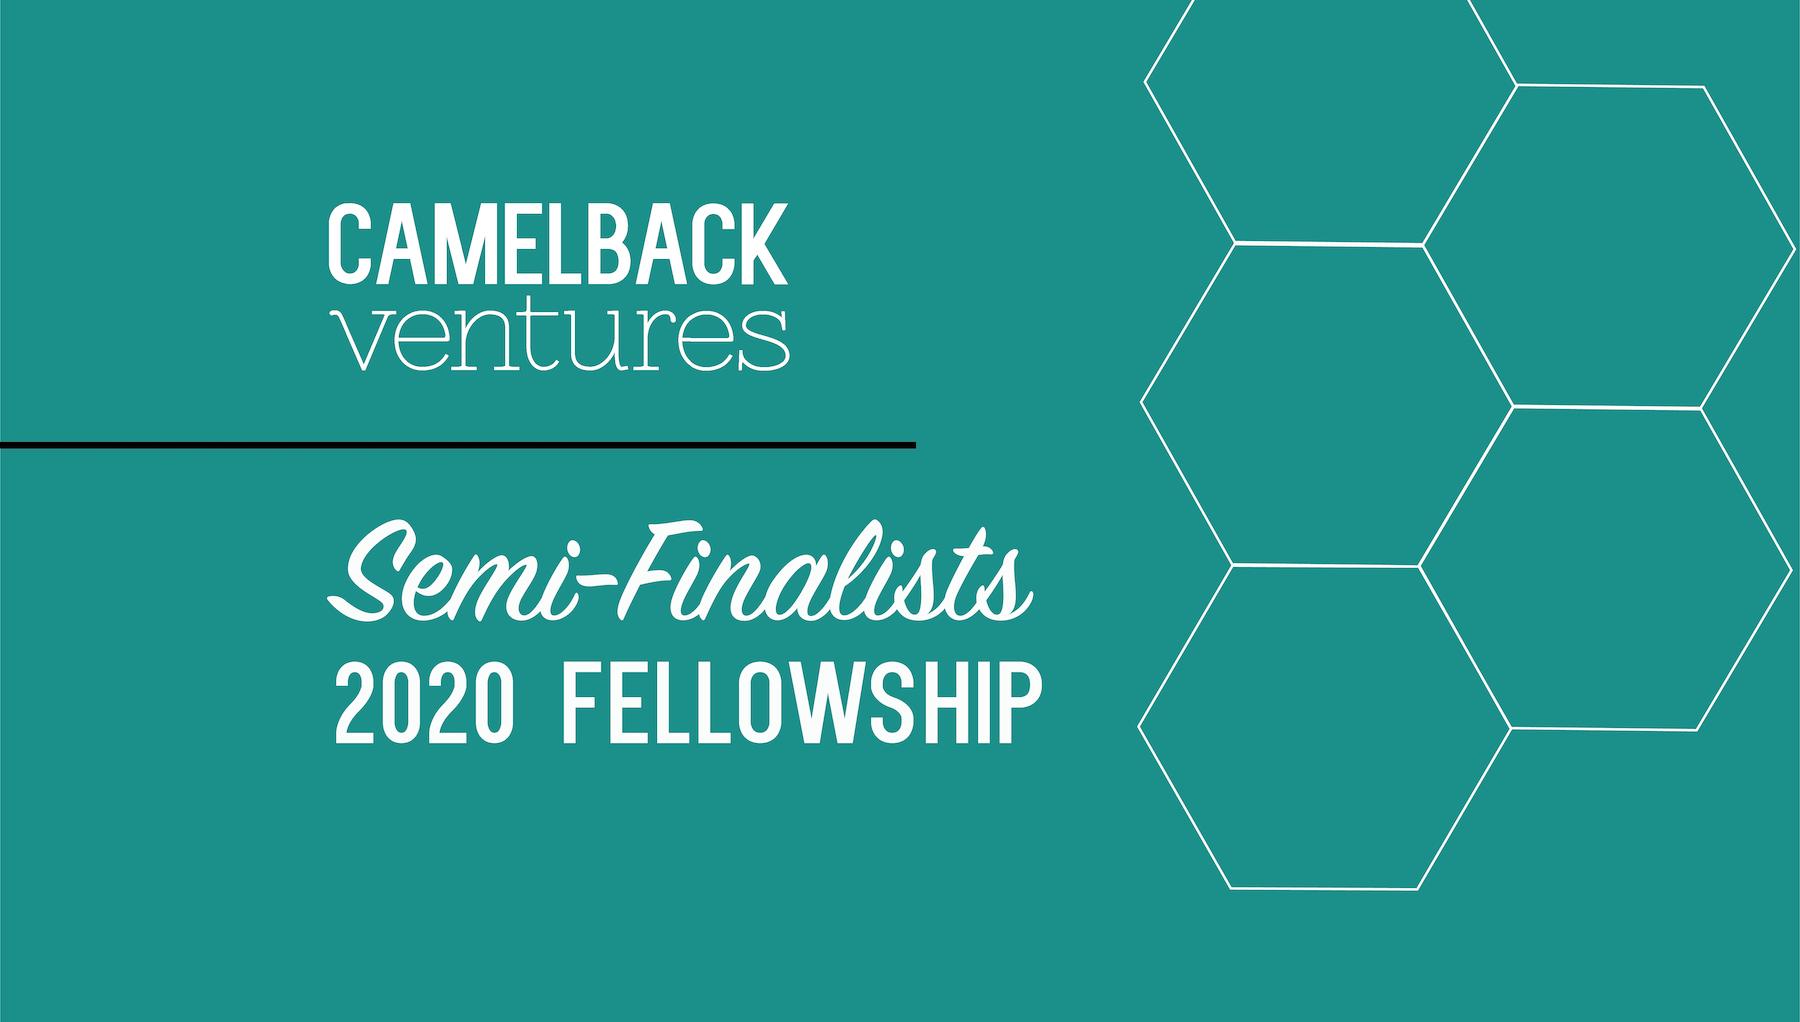 camelback_2020r1__2020semifinalist_cover.jpg